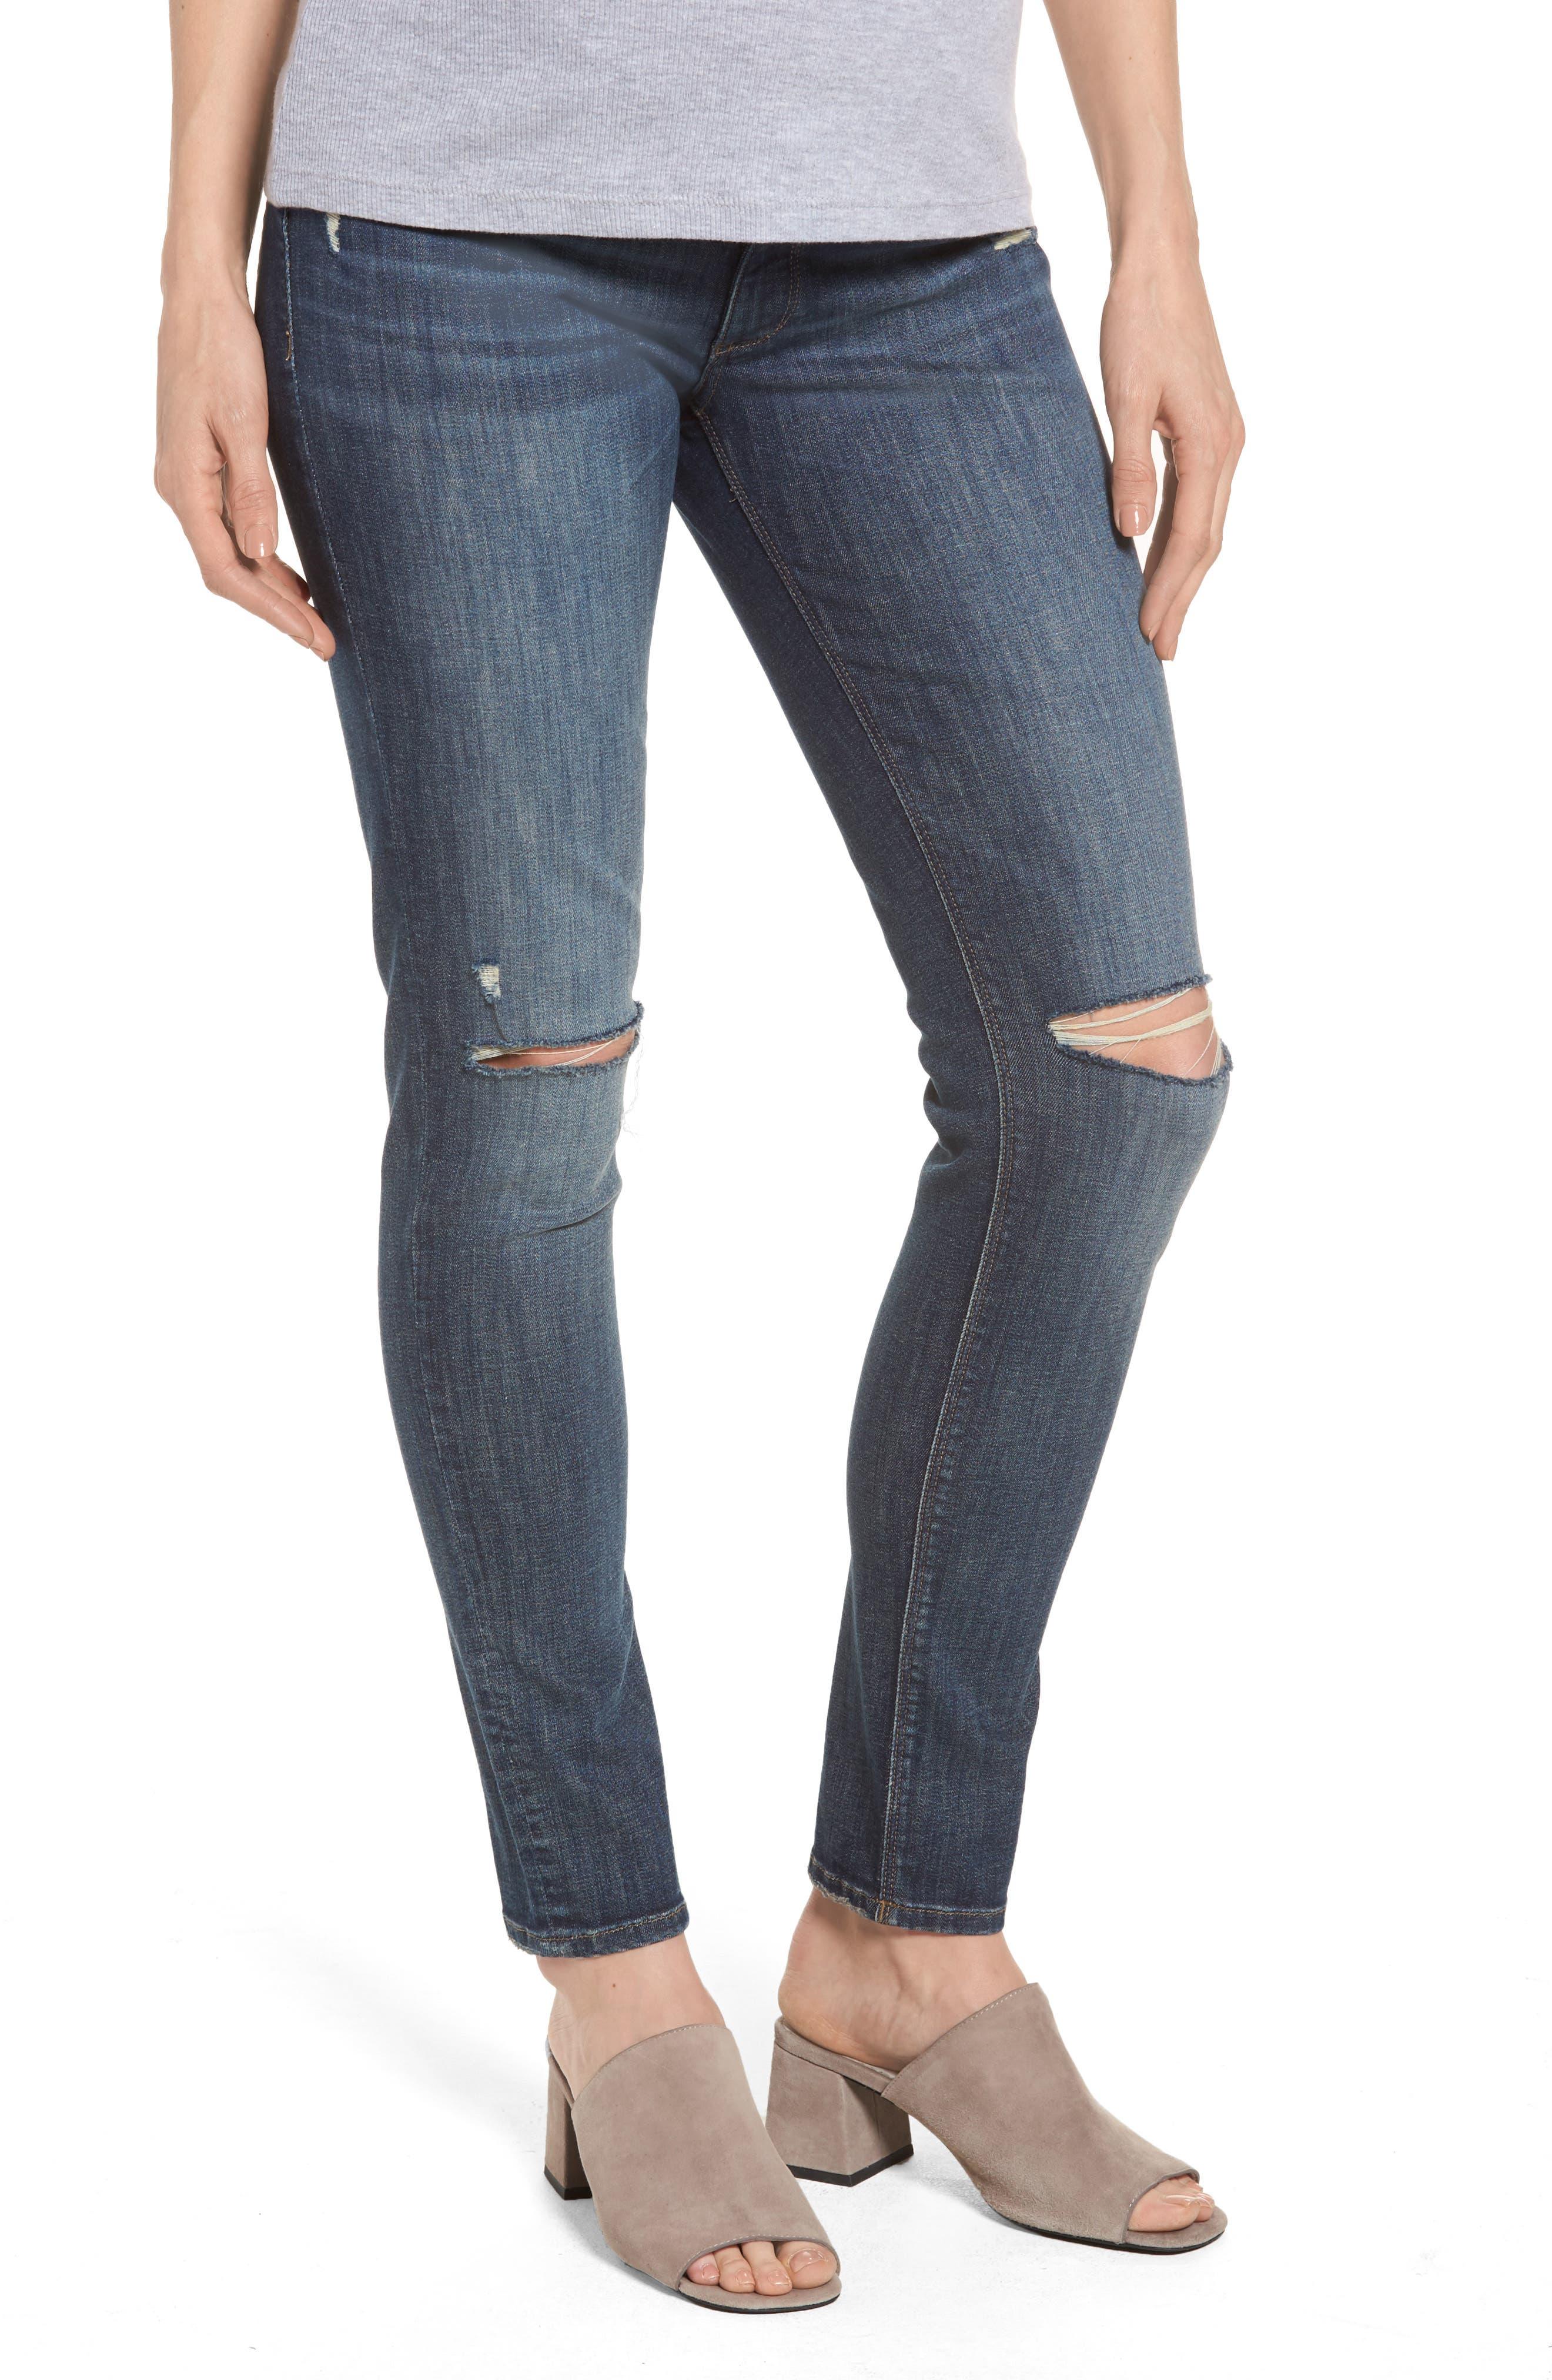 Emma Power Legging Maternity Jeans,                         Main,                         color, Heath